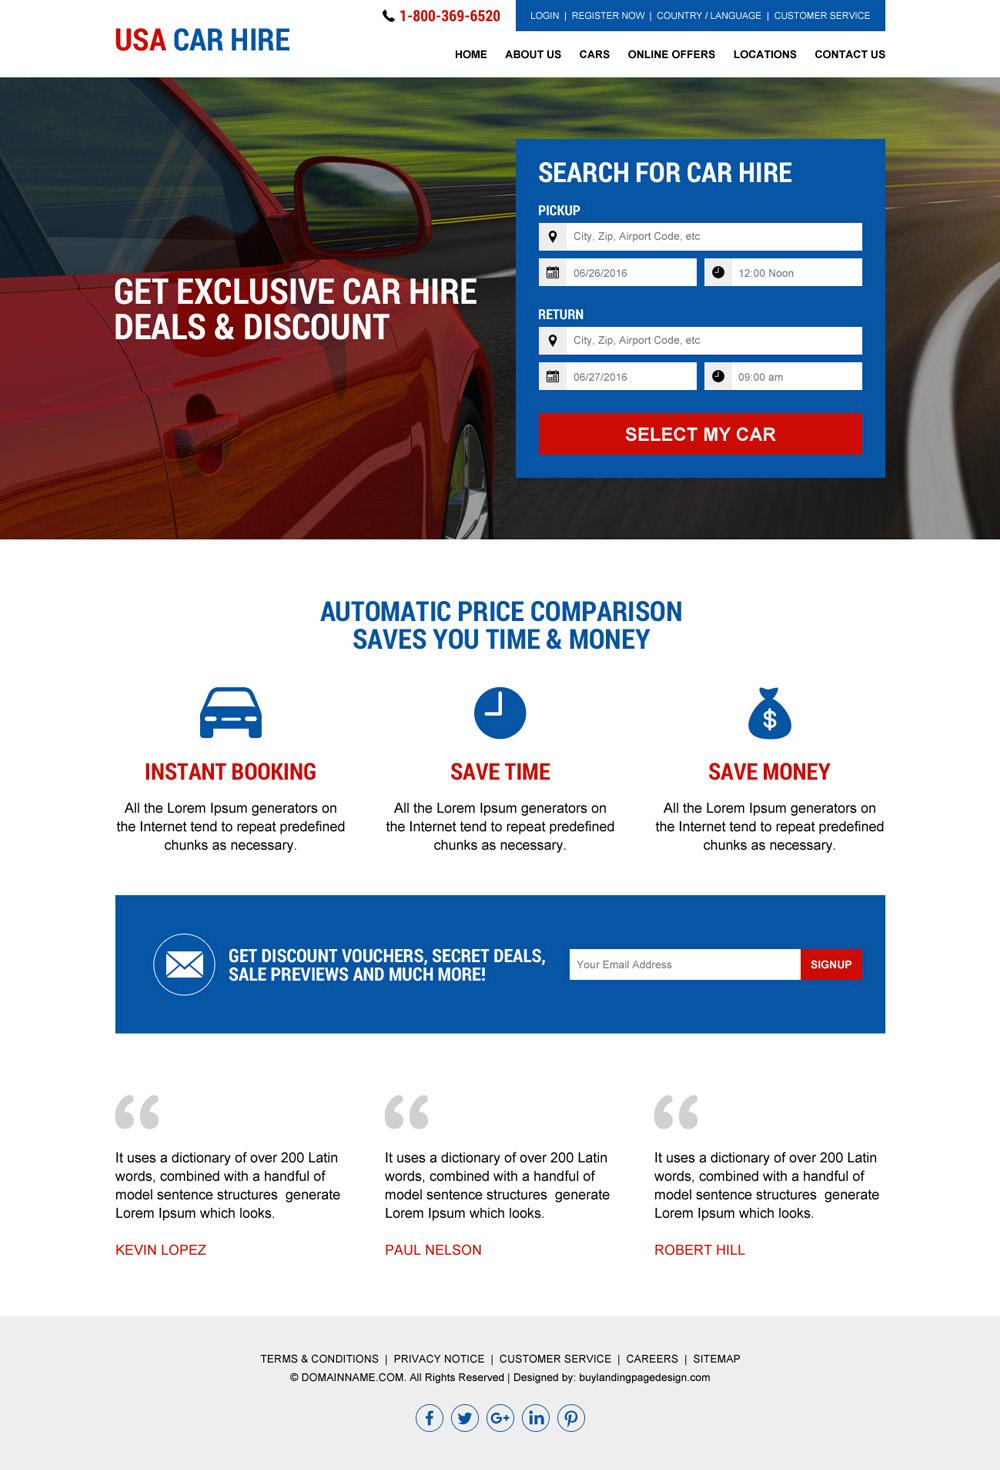 Car Rental Usa >> Download Usa Car Hire Services Responsive Website Design